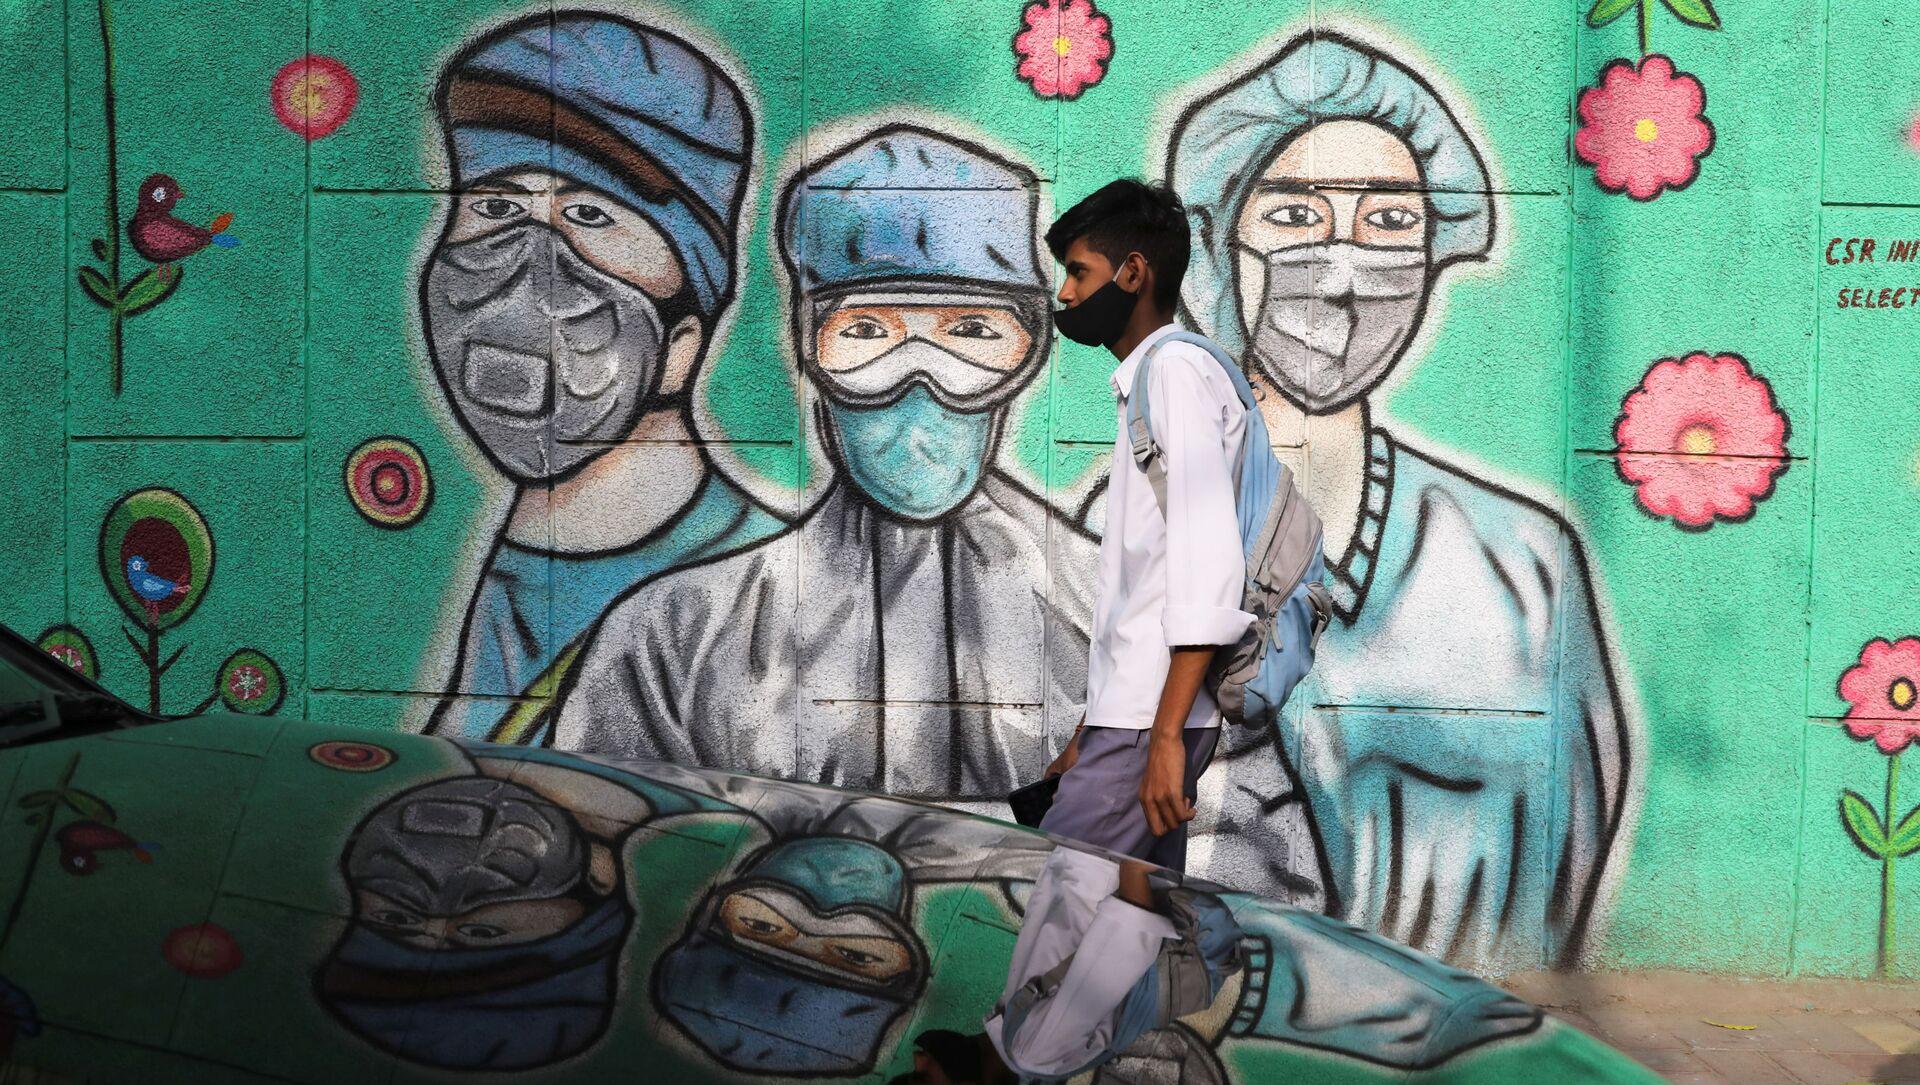 A boy walks past a graffiti amidst the spread of the coronavirus disease (COVID-19) on a street in New Delhi, India, March 22, 2021 - Sputnik International, 1920, 24.03.2021